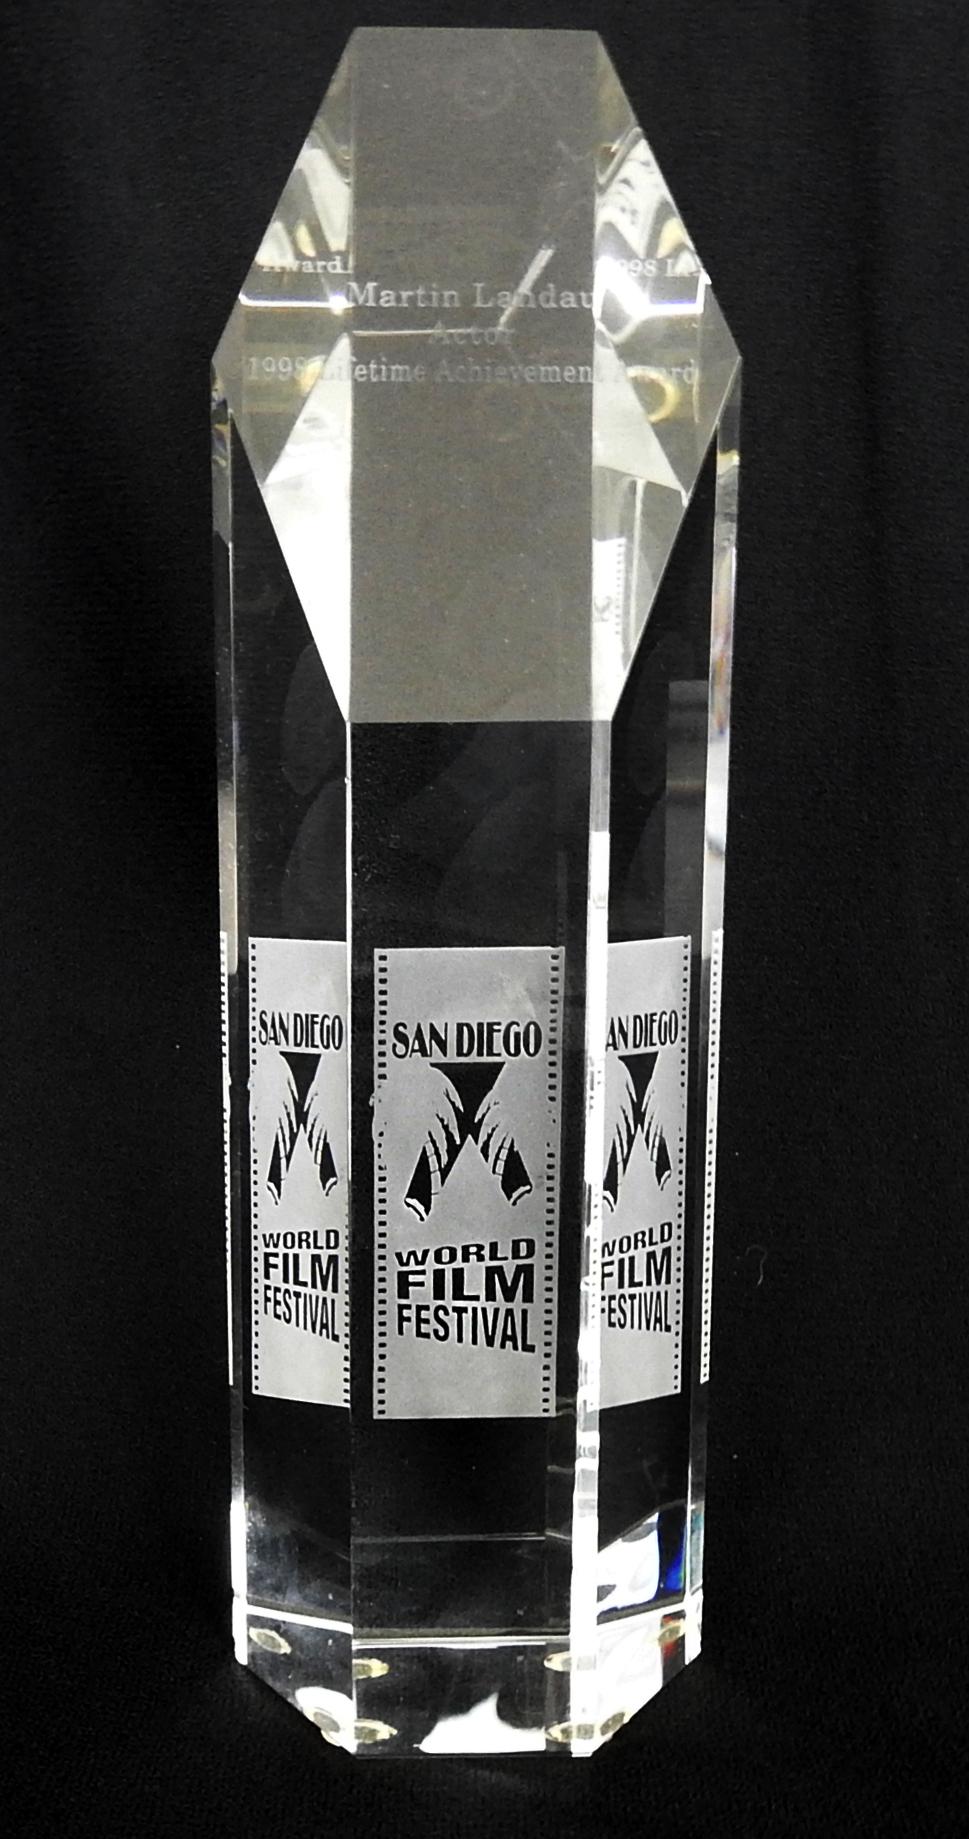 MARTIN LANDAU Lifetime Achievement Award San Diego 1998